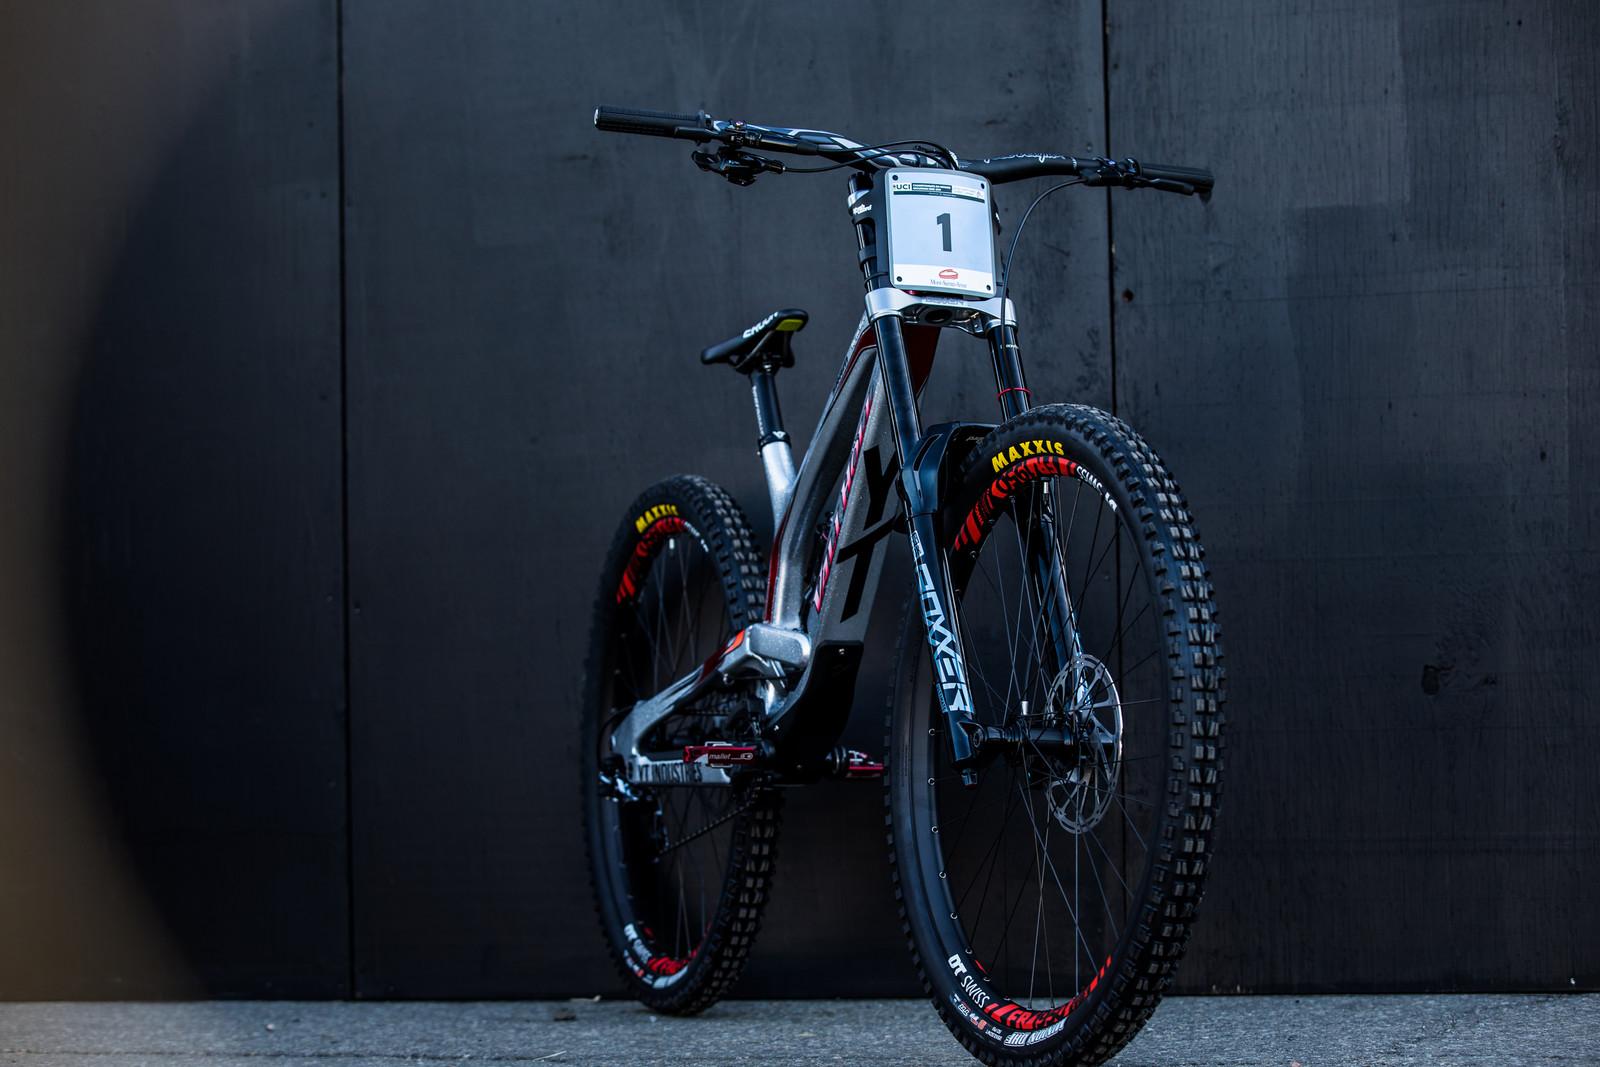 Vali Holl's YT TUES at 2019 Worlds MSA - Vali Holl's YT TUES at 2019 Worlds MSA - Mountain Biking Pictures - Vital MTB